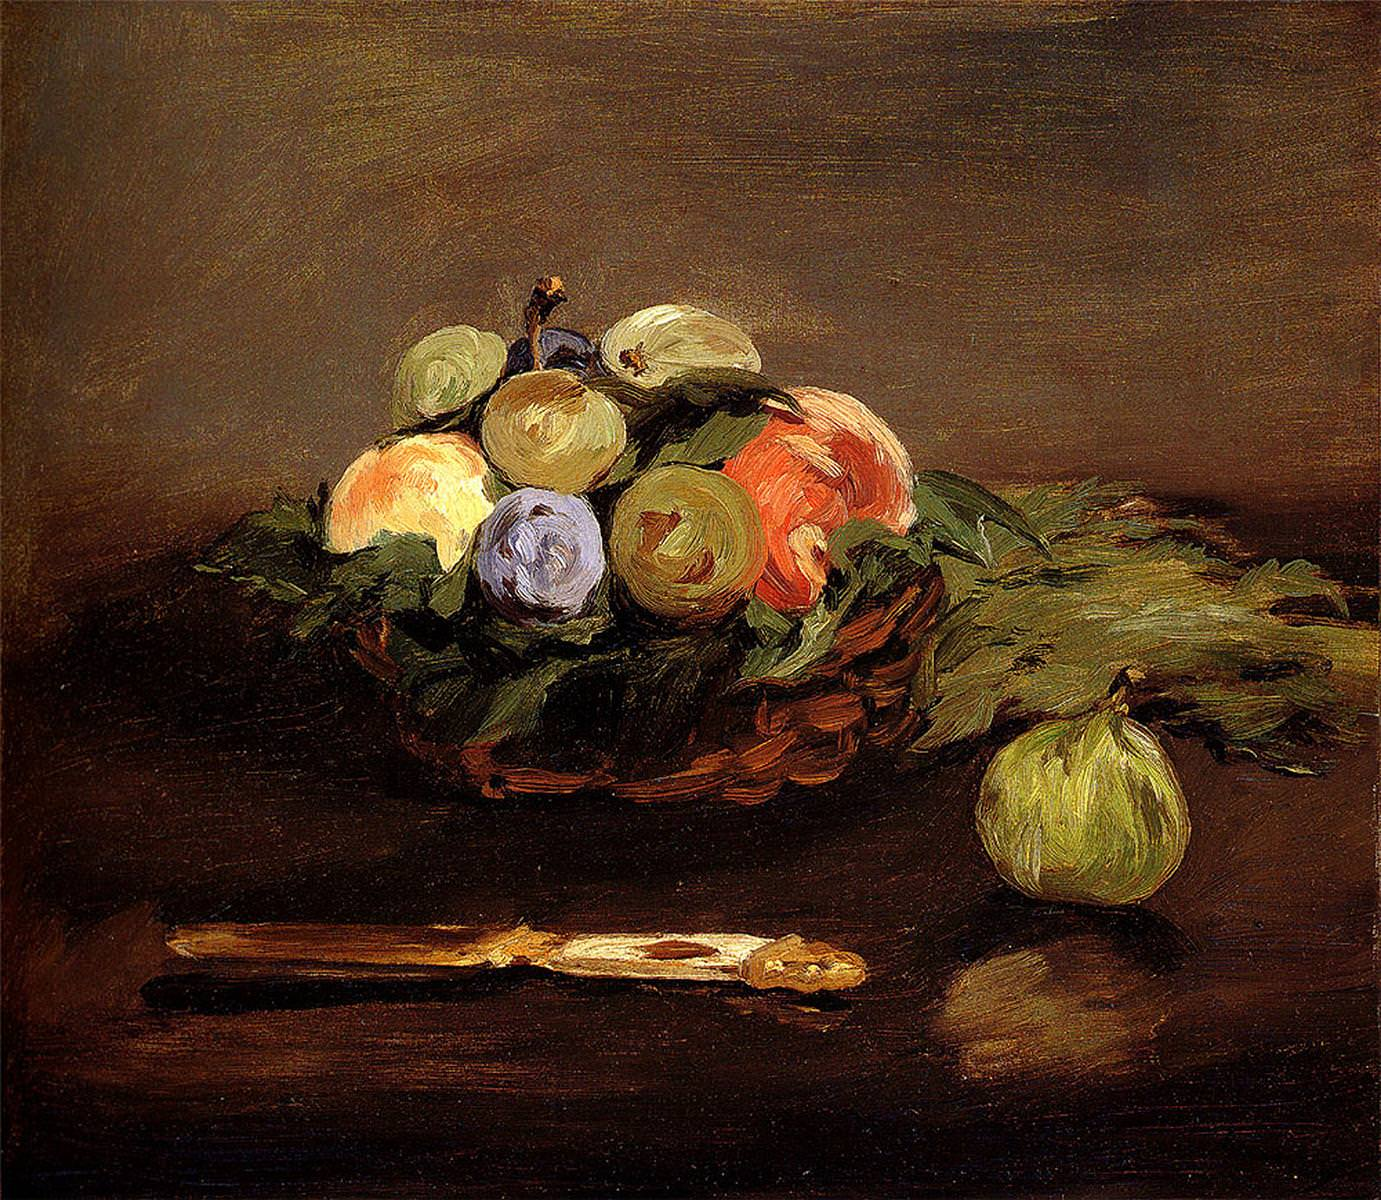 Edouard Manet, Fruchtkorb, um 1864, Öl auf Leinwand, 37,8 x 44,4 cm (Museum of Fine Arts, Boston)